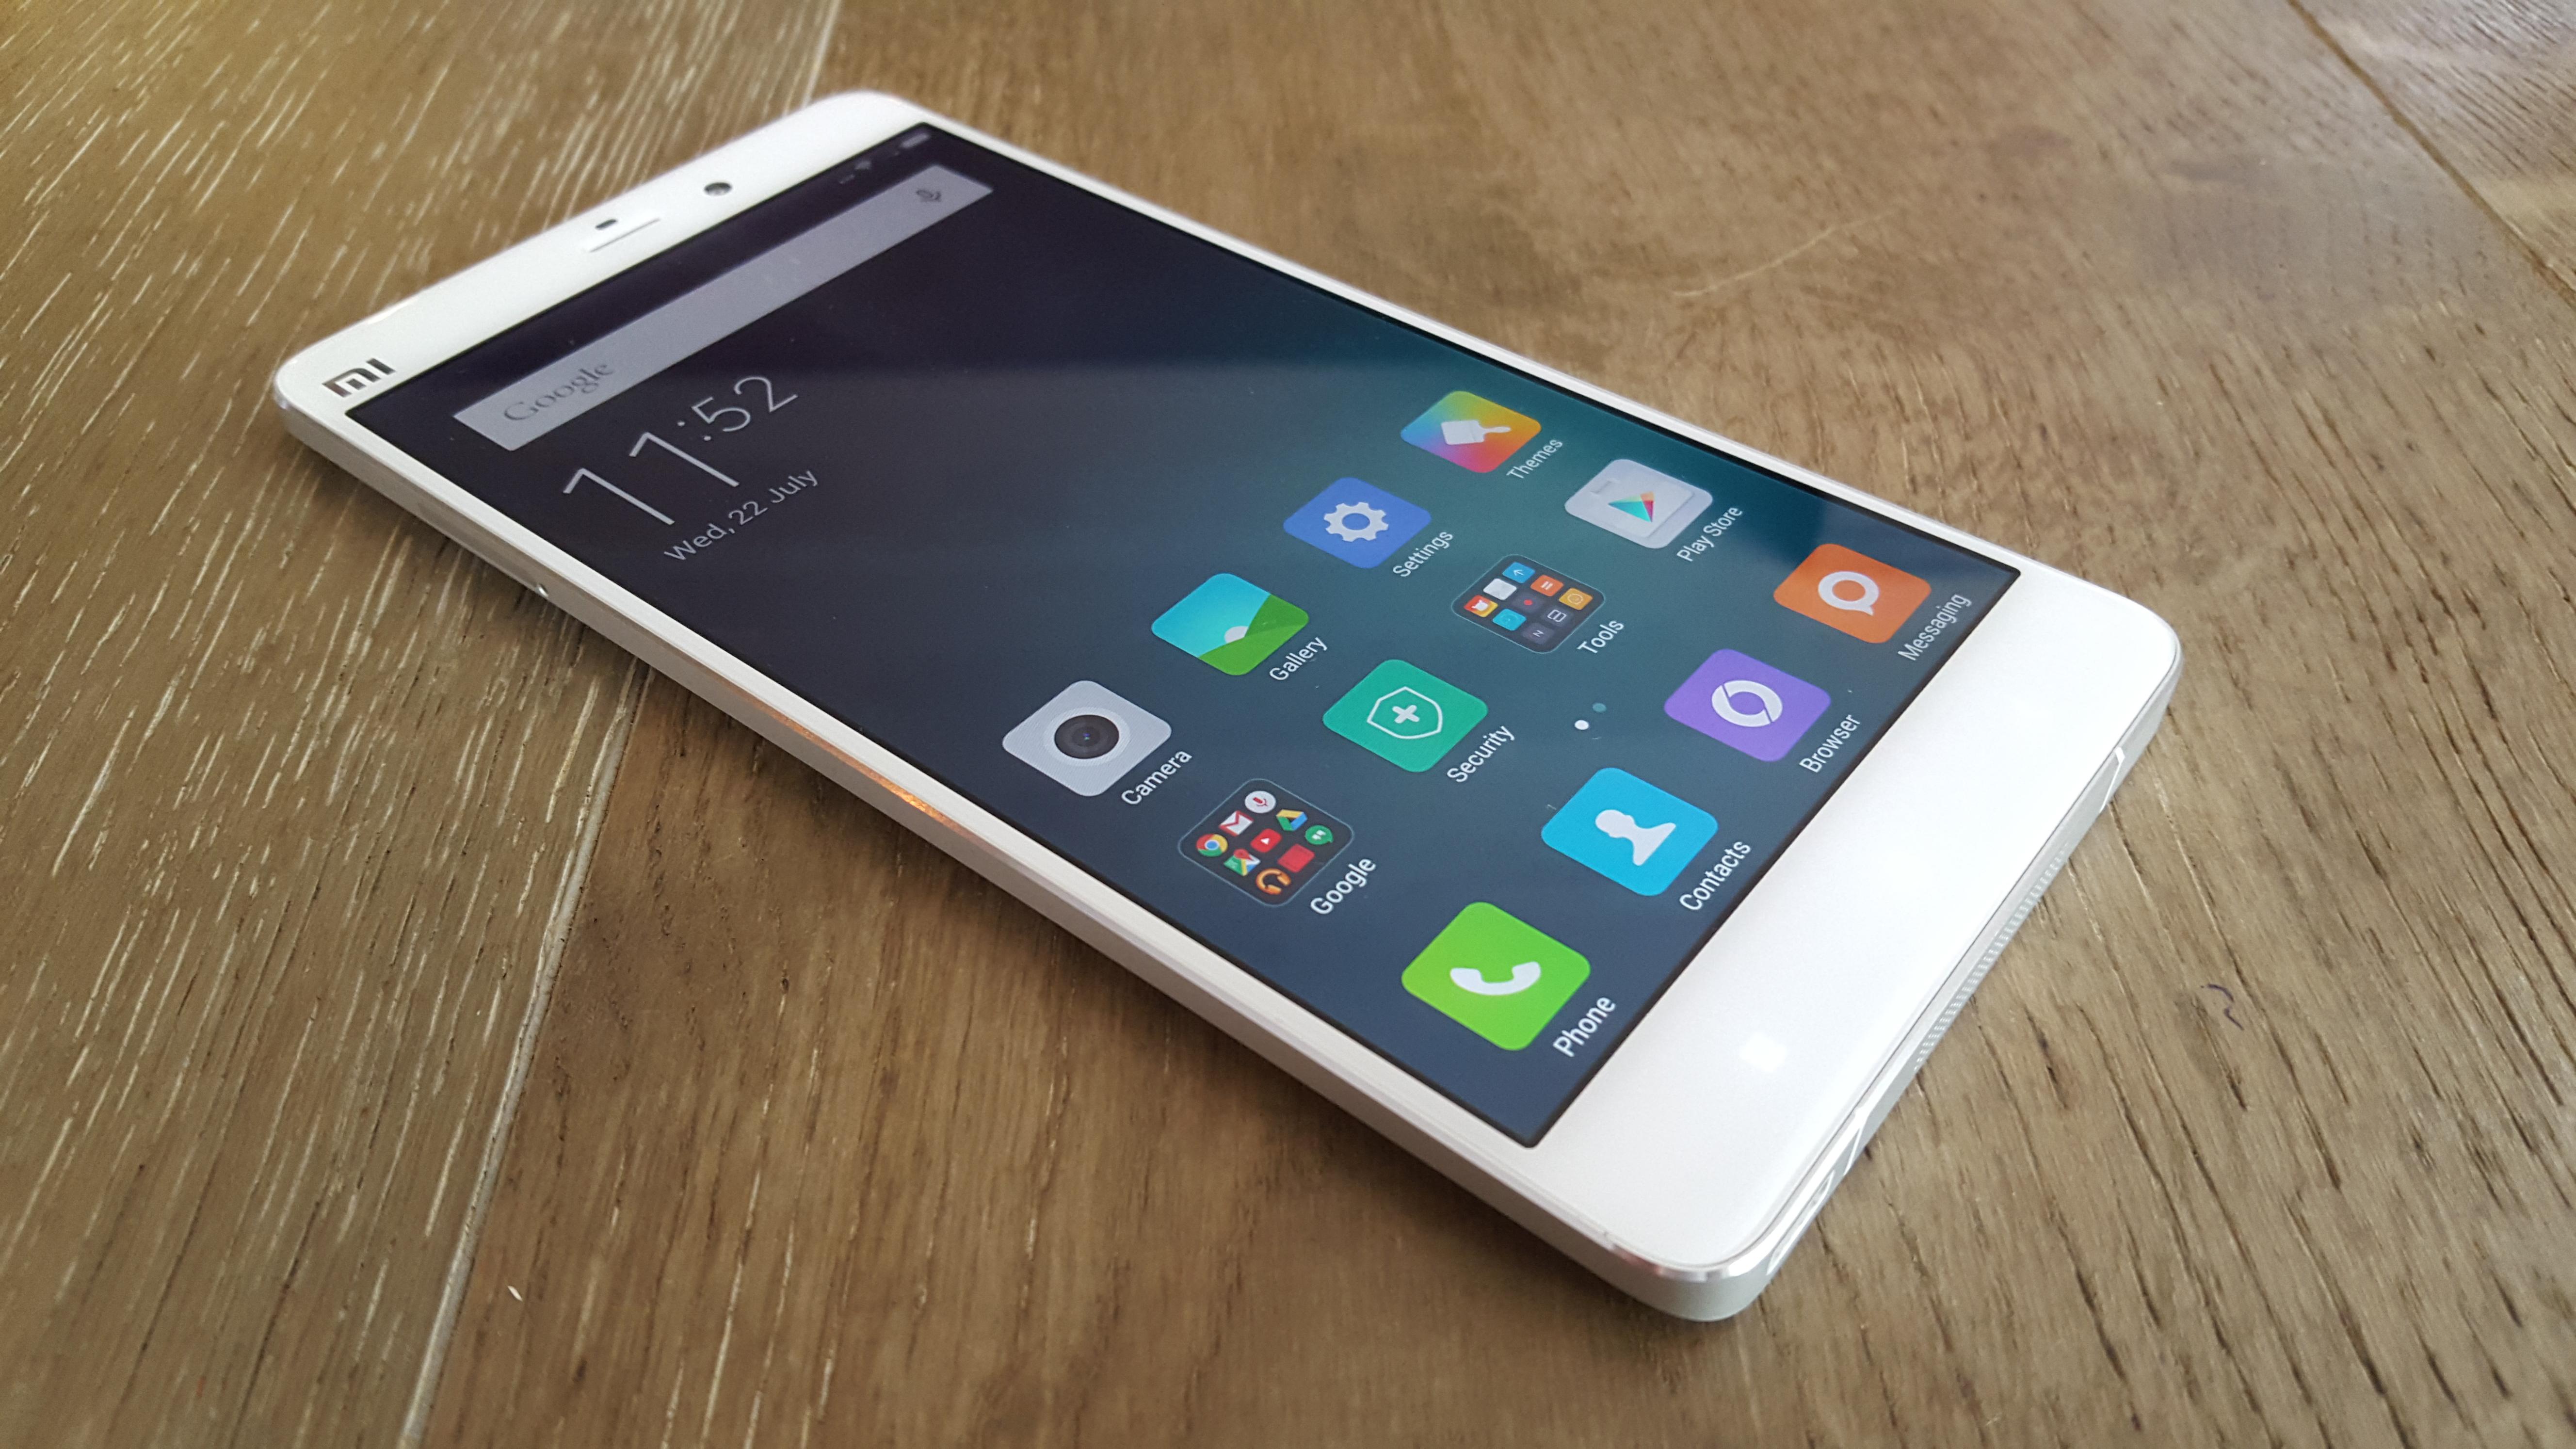 Xiaomi Mi Note: Order one via Uber | The Star Online